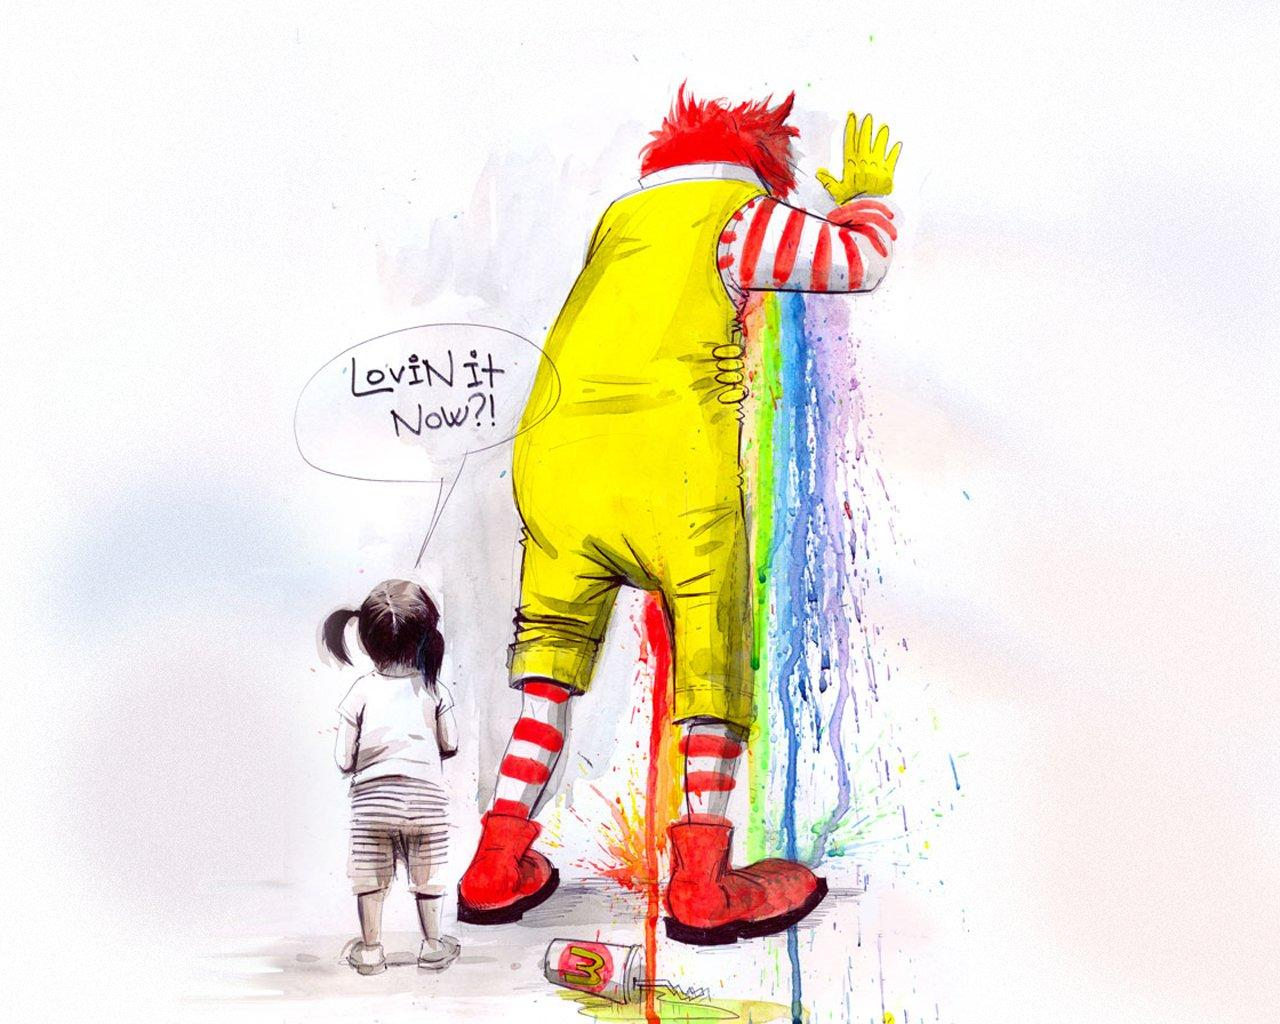 mcdonalds-mcdonalds-food